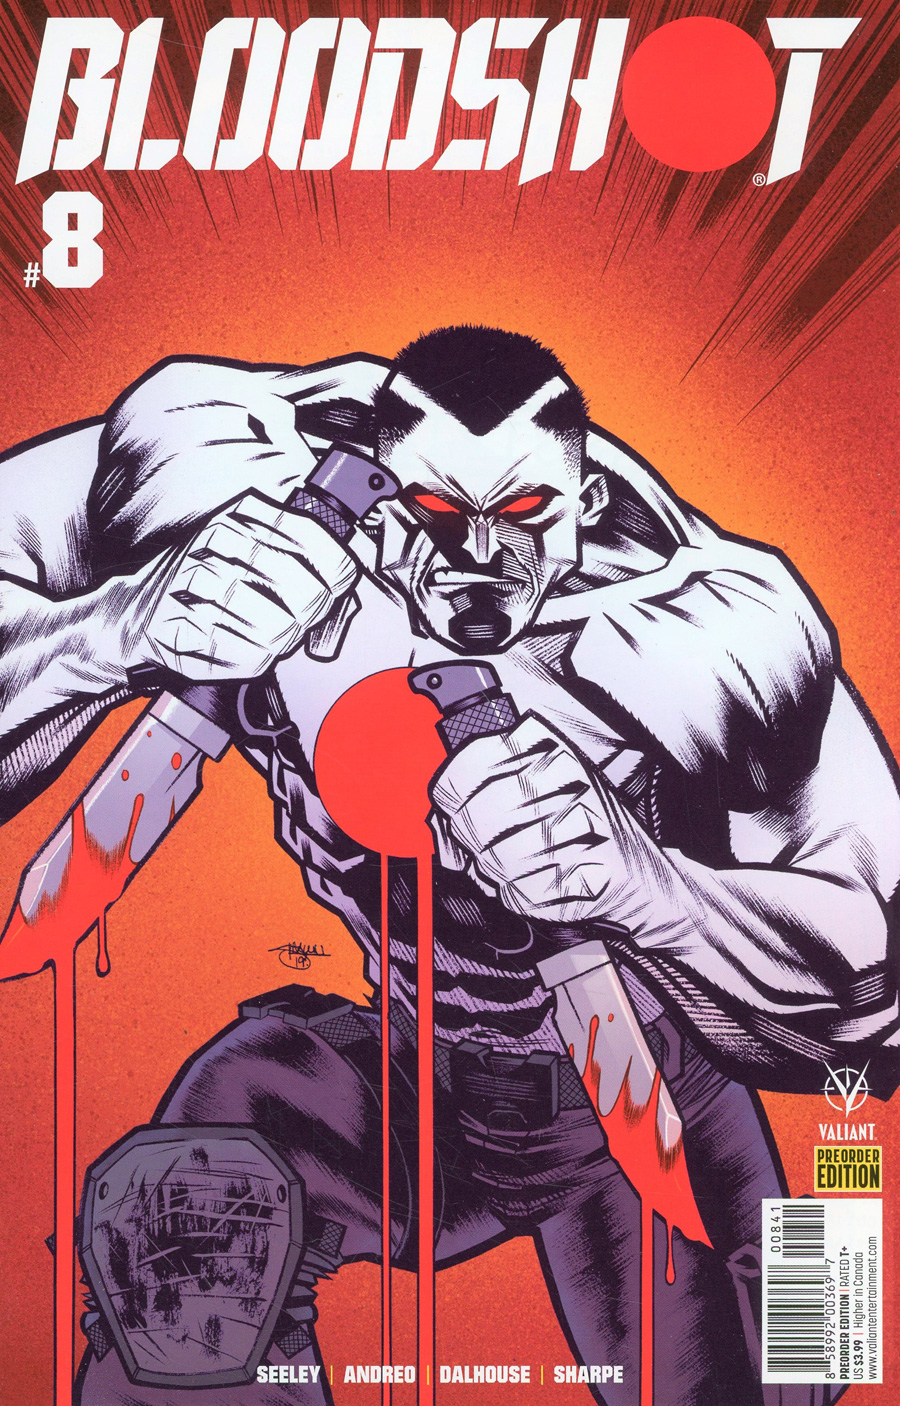 Bloodshot Vol 4 #8 Cover D Variant Pre-Order Edition